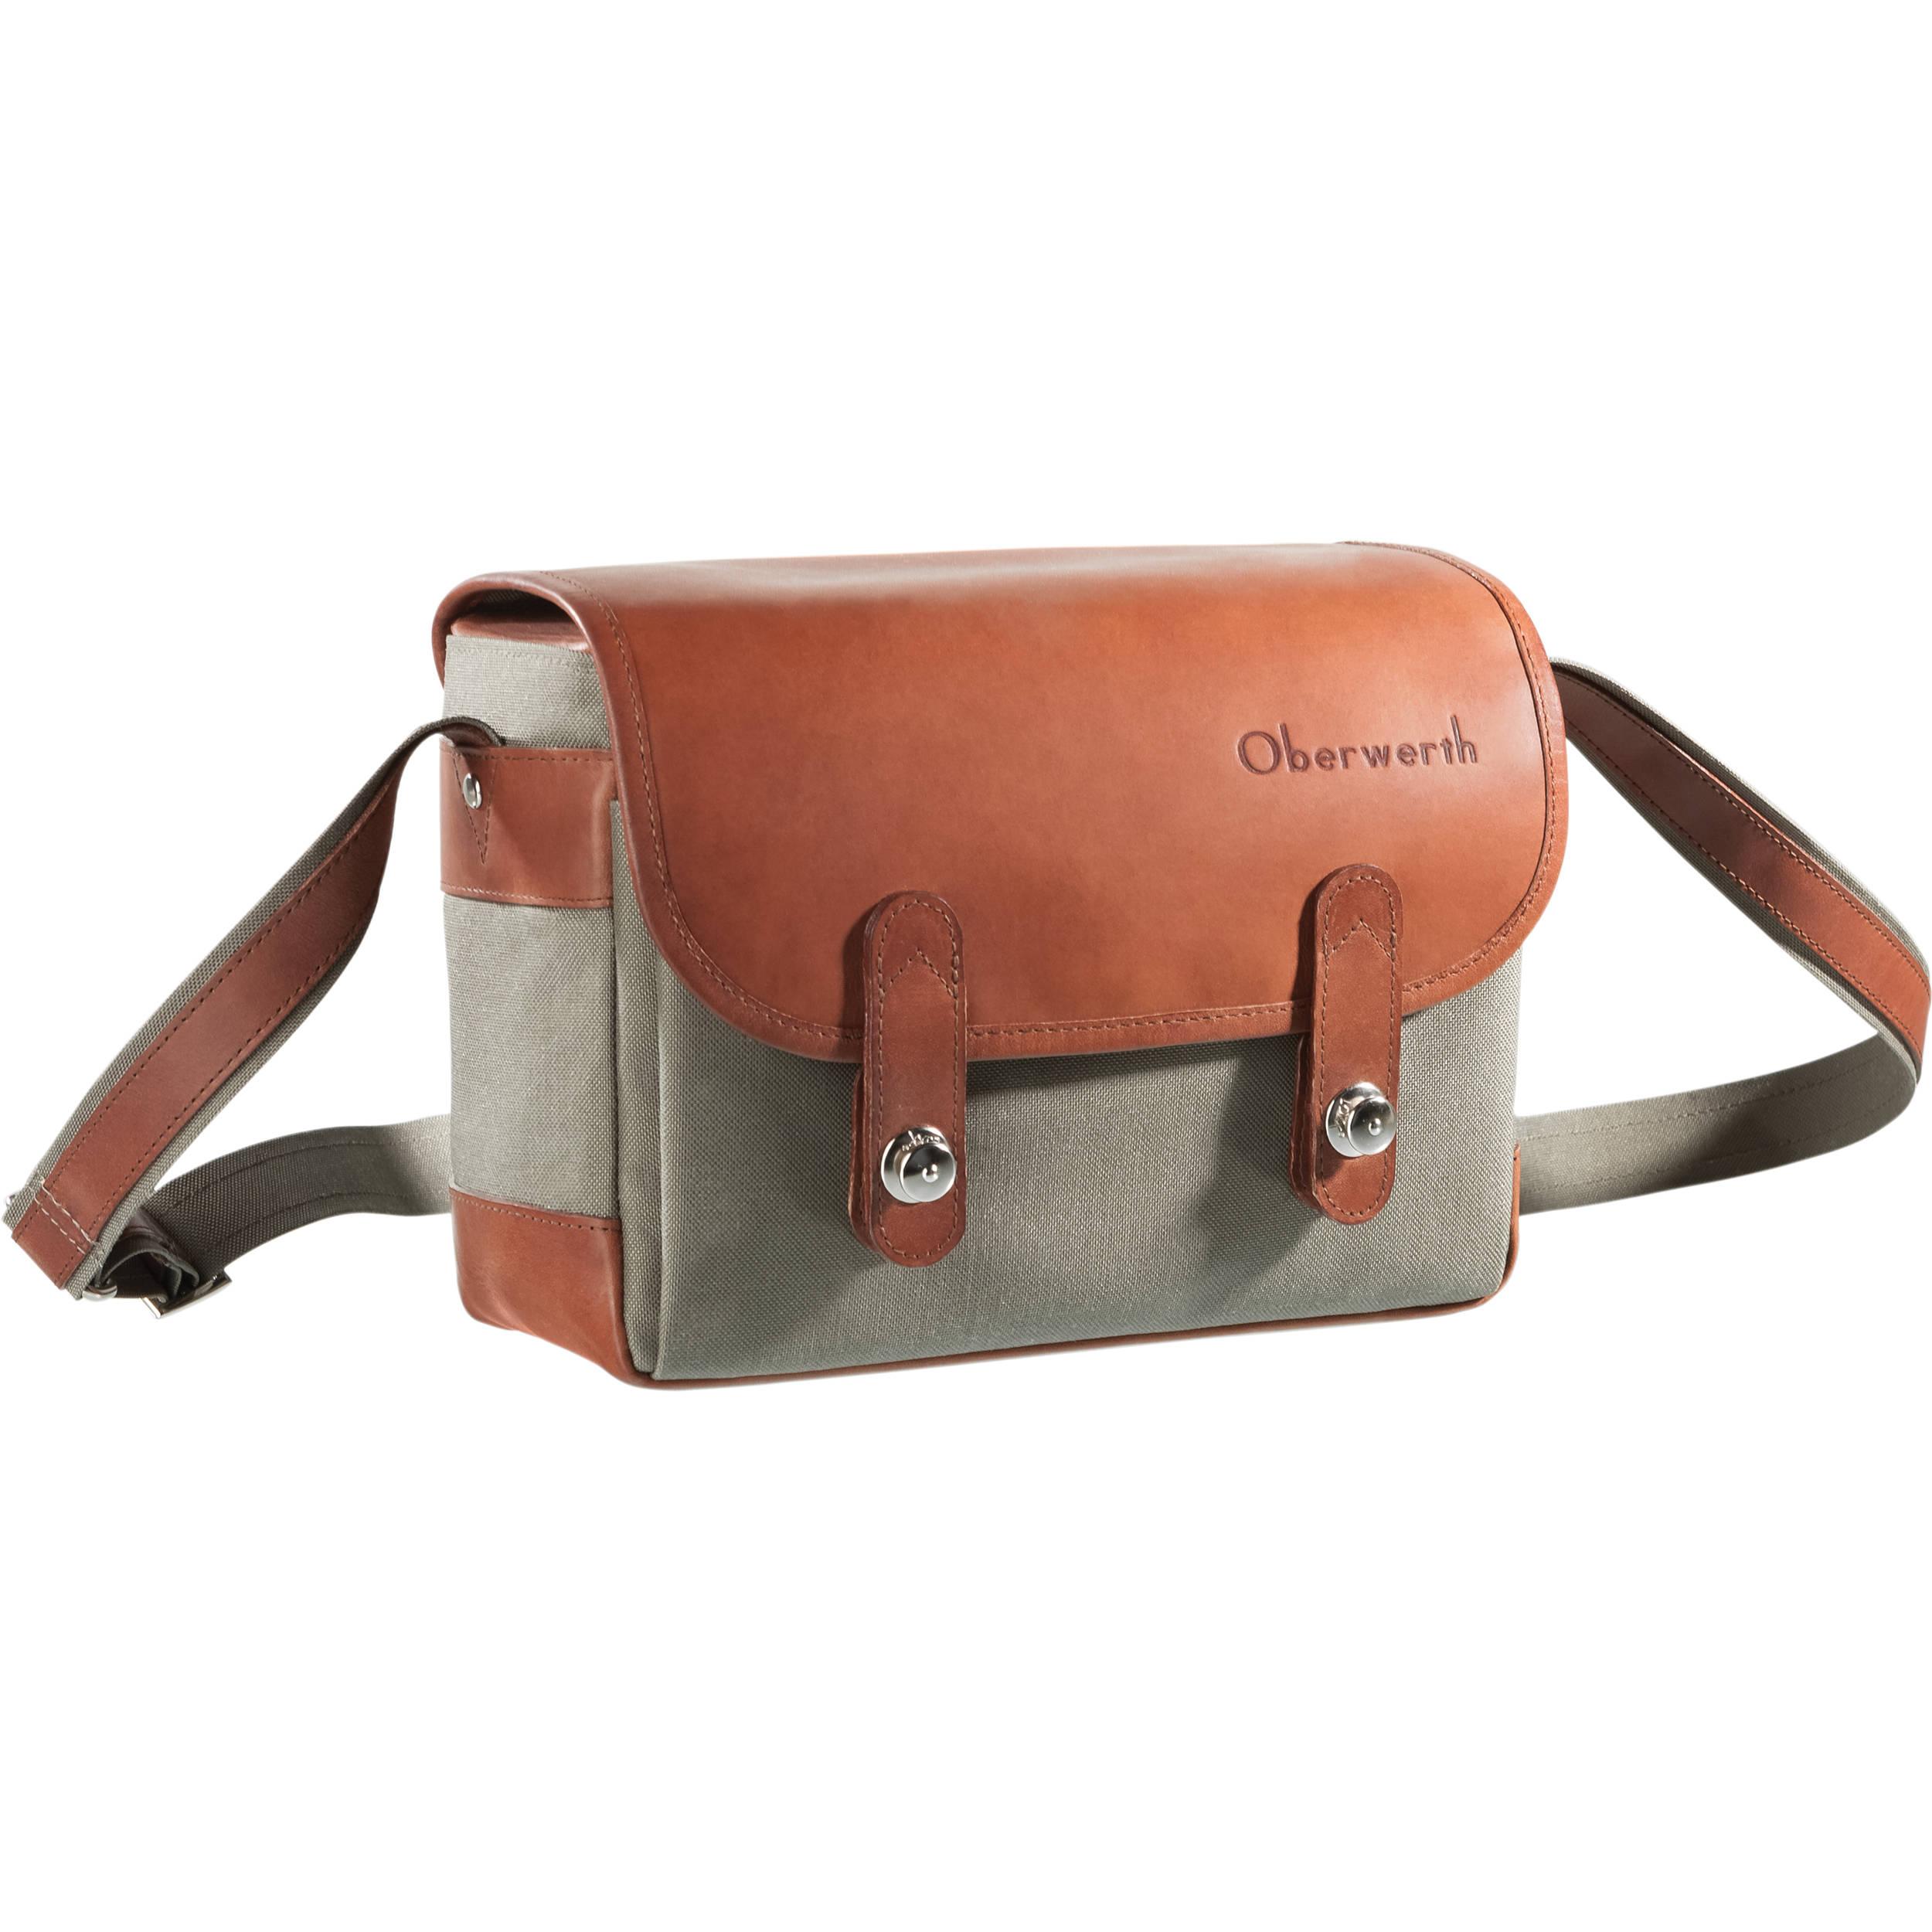 Camera Small Camera Bag For Dslr oberwerth freiburg small camera bag f co lb 103 bh photo video olivelight brown